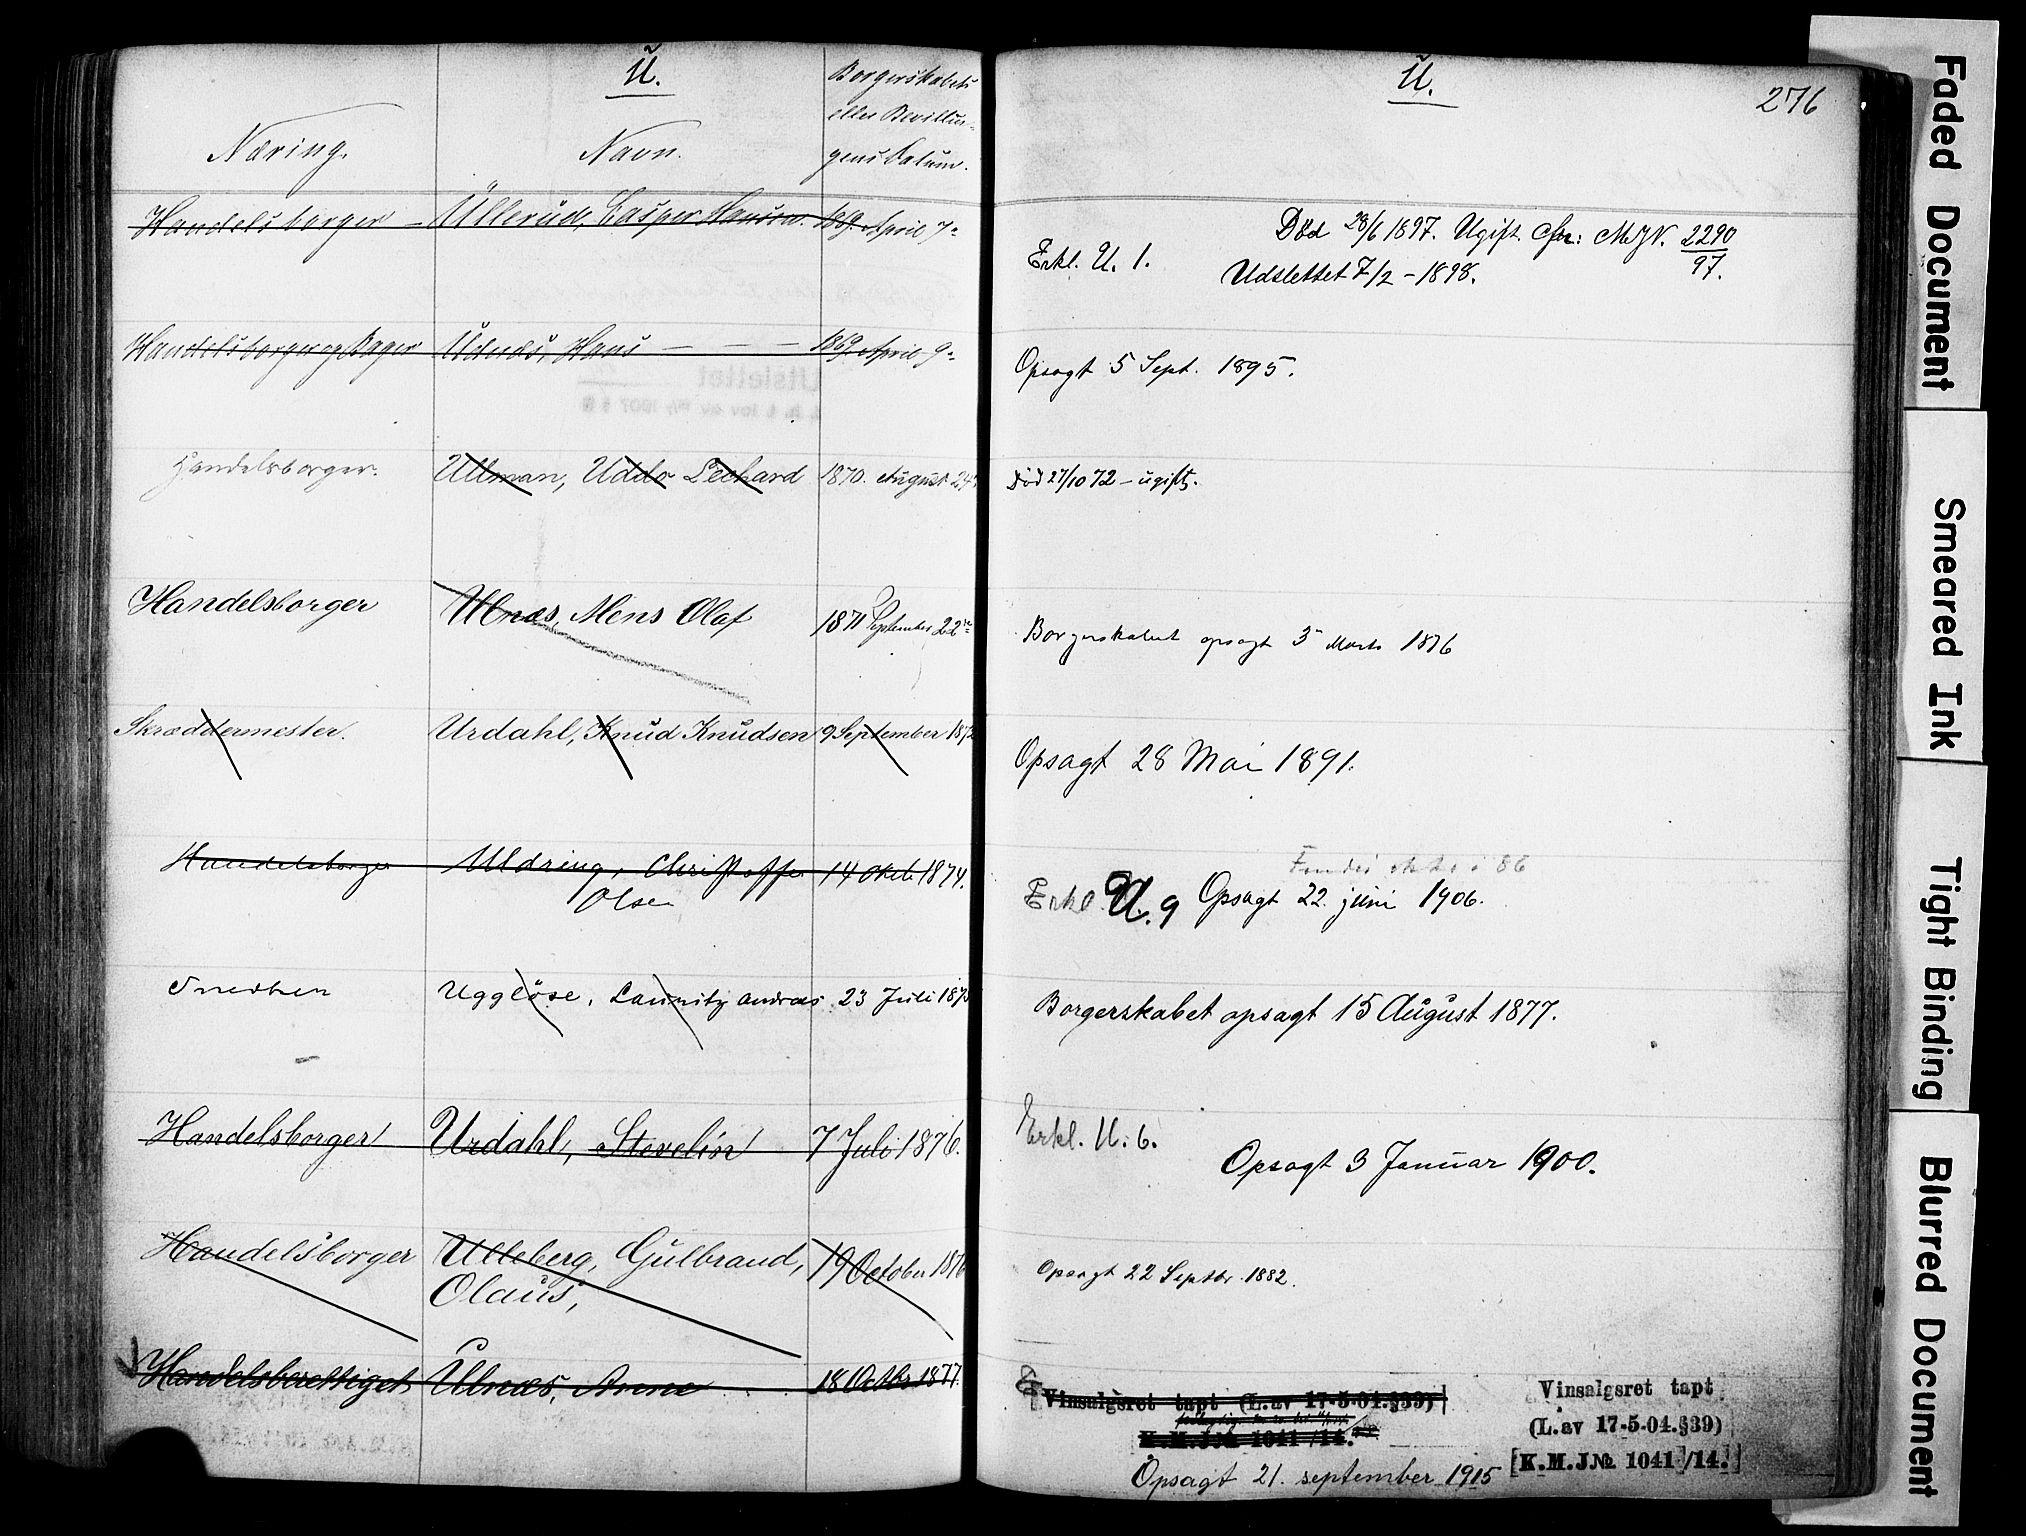 SAO, Kristiania magistrat, F/Fb/L0004: Borgerrulle, 1860-1879, s. 278